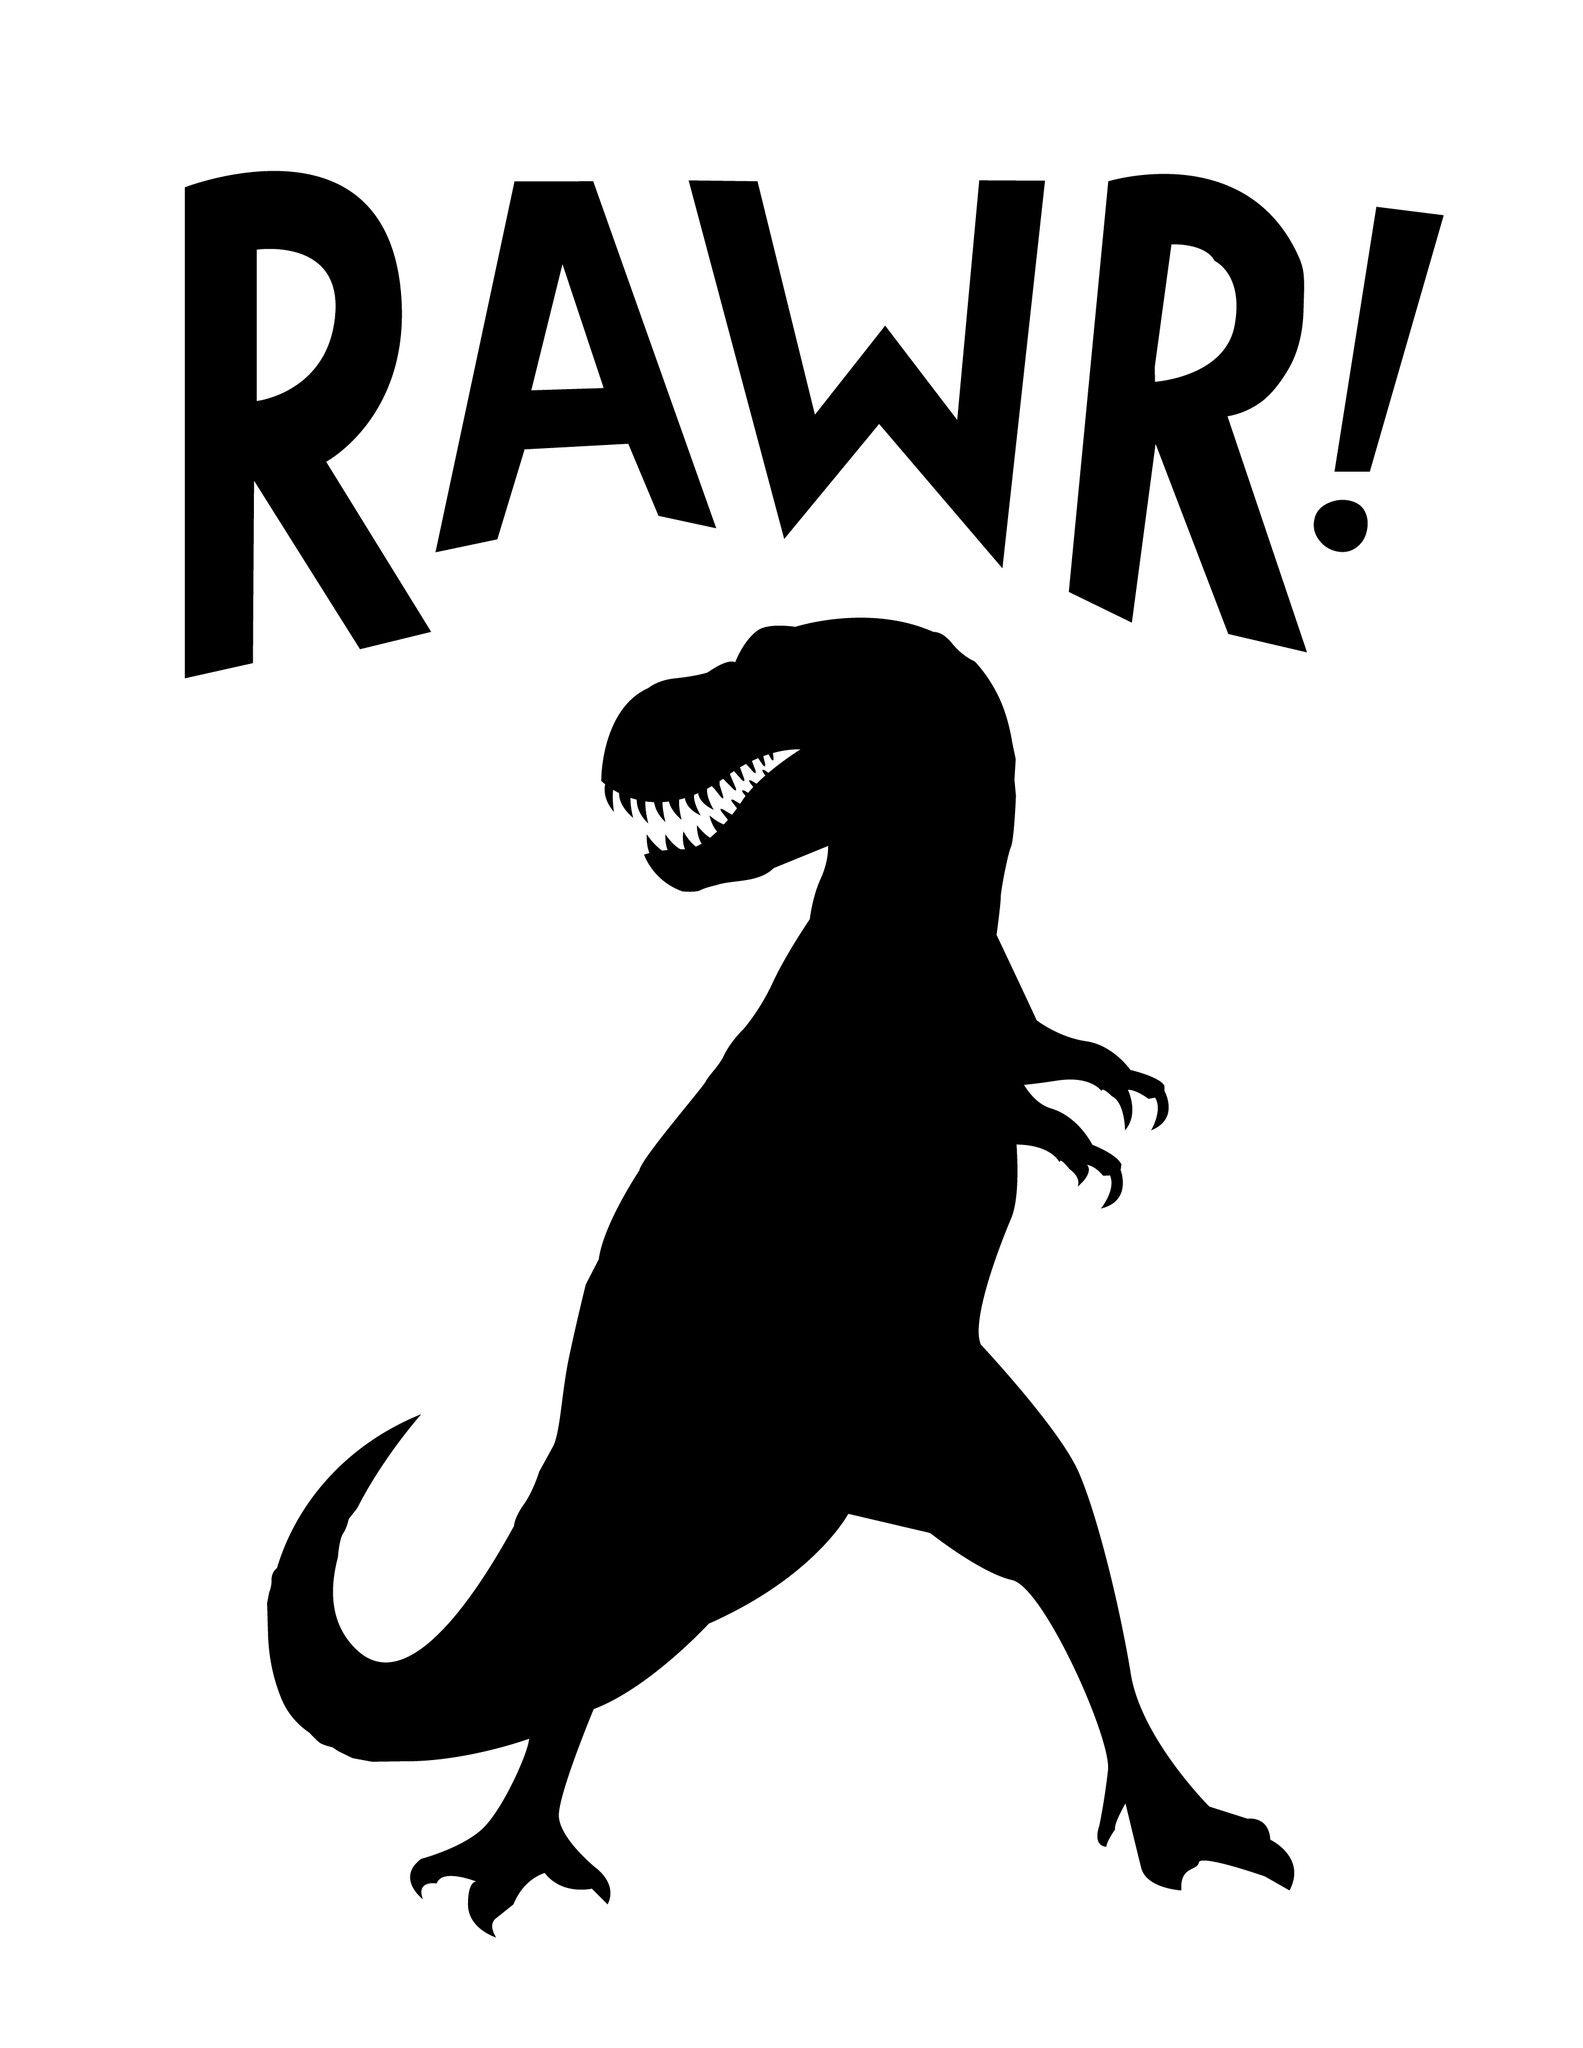 rawr dinosaur theme nursery poster dinosaurier. Black Bedroom Furniture Sets. Home Design Ideas